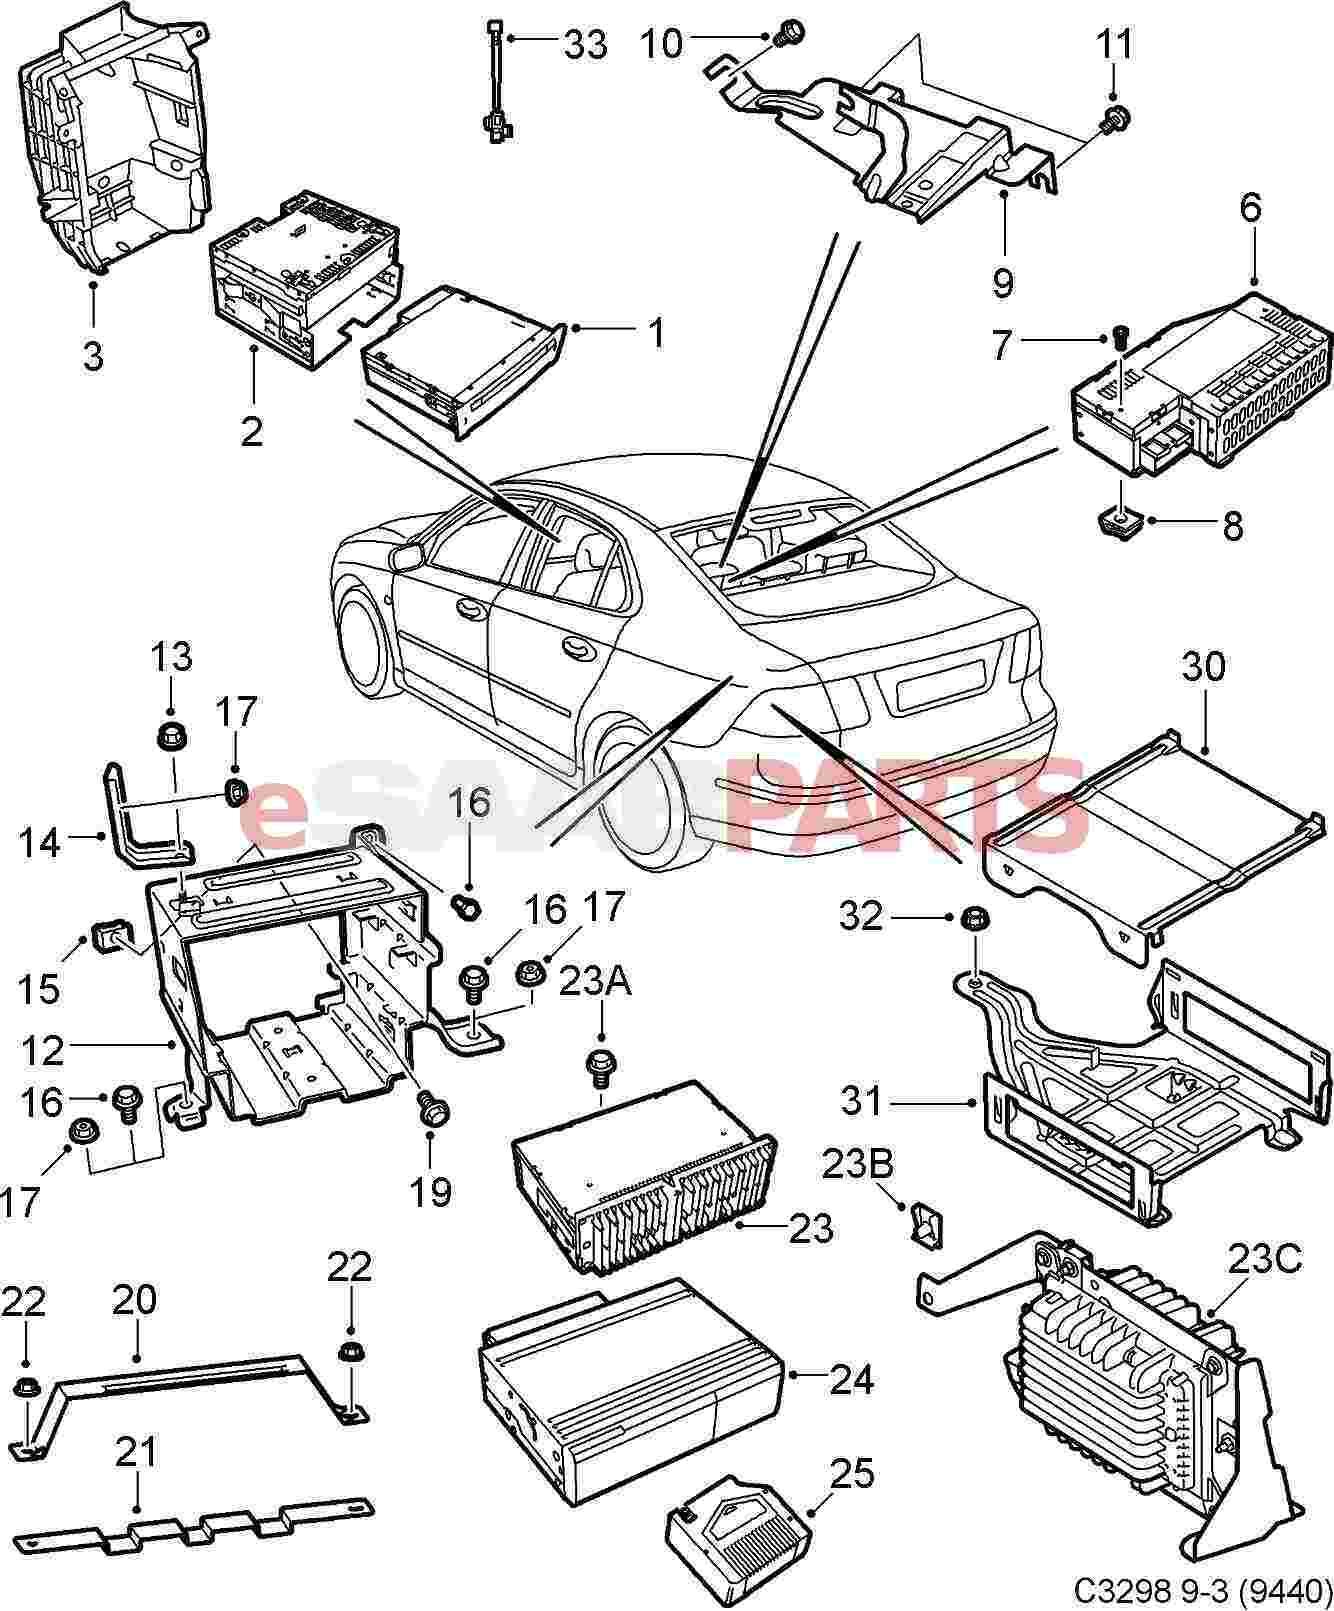 heat york diagram n wiring pump ahc1606a wiring diagramsheat york diagram n  wiring pump ahc1606a wiring